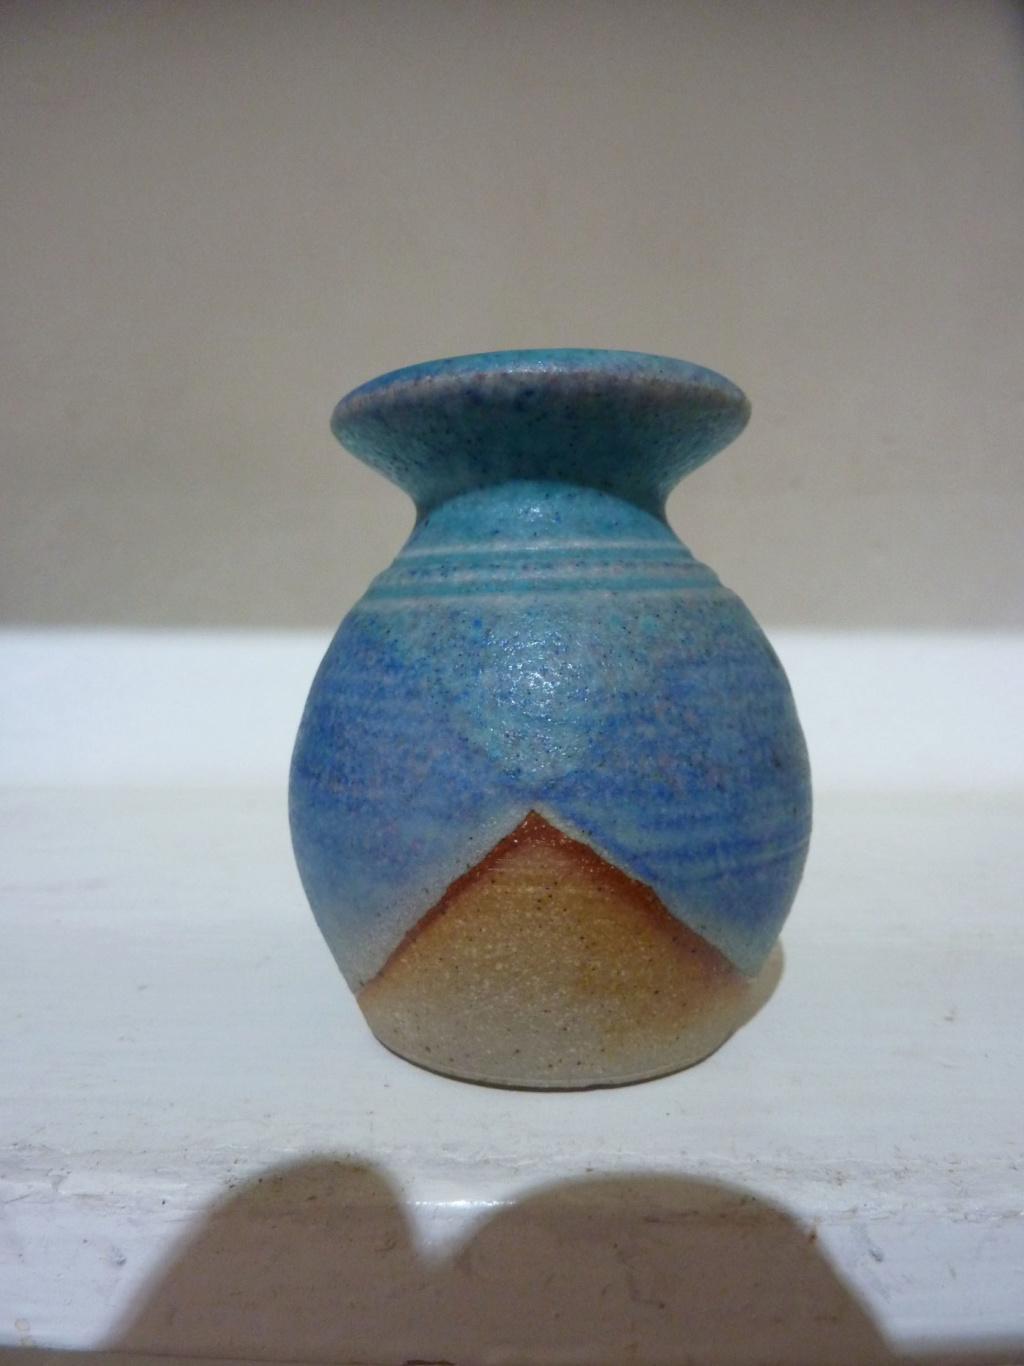 Vivienne Hills & Alan Baxter, Pontardawe Pottery (Wales) 00110